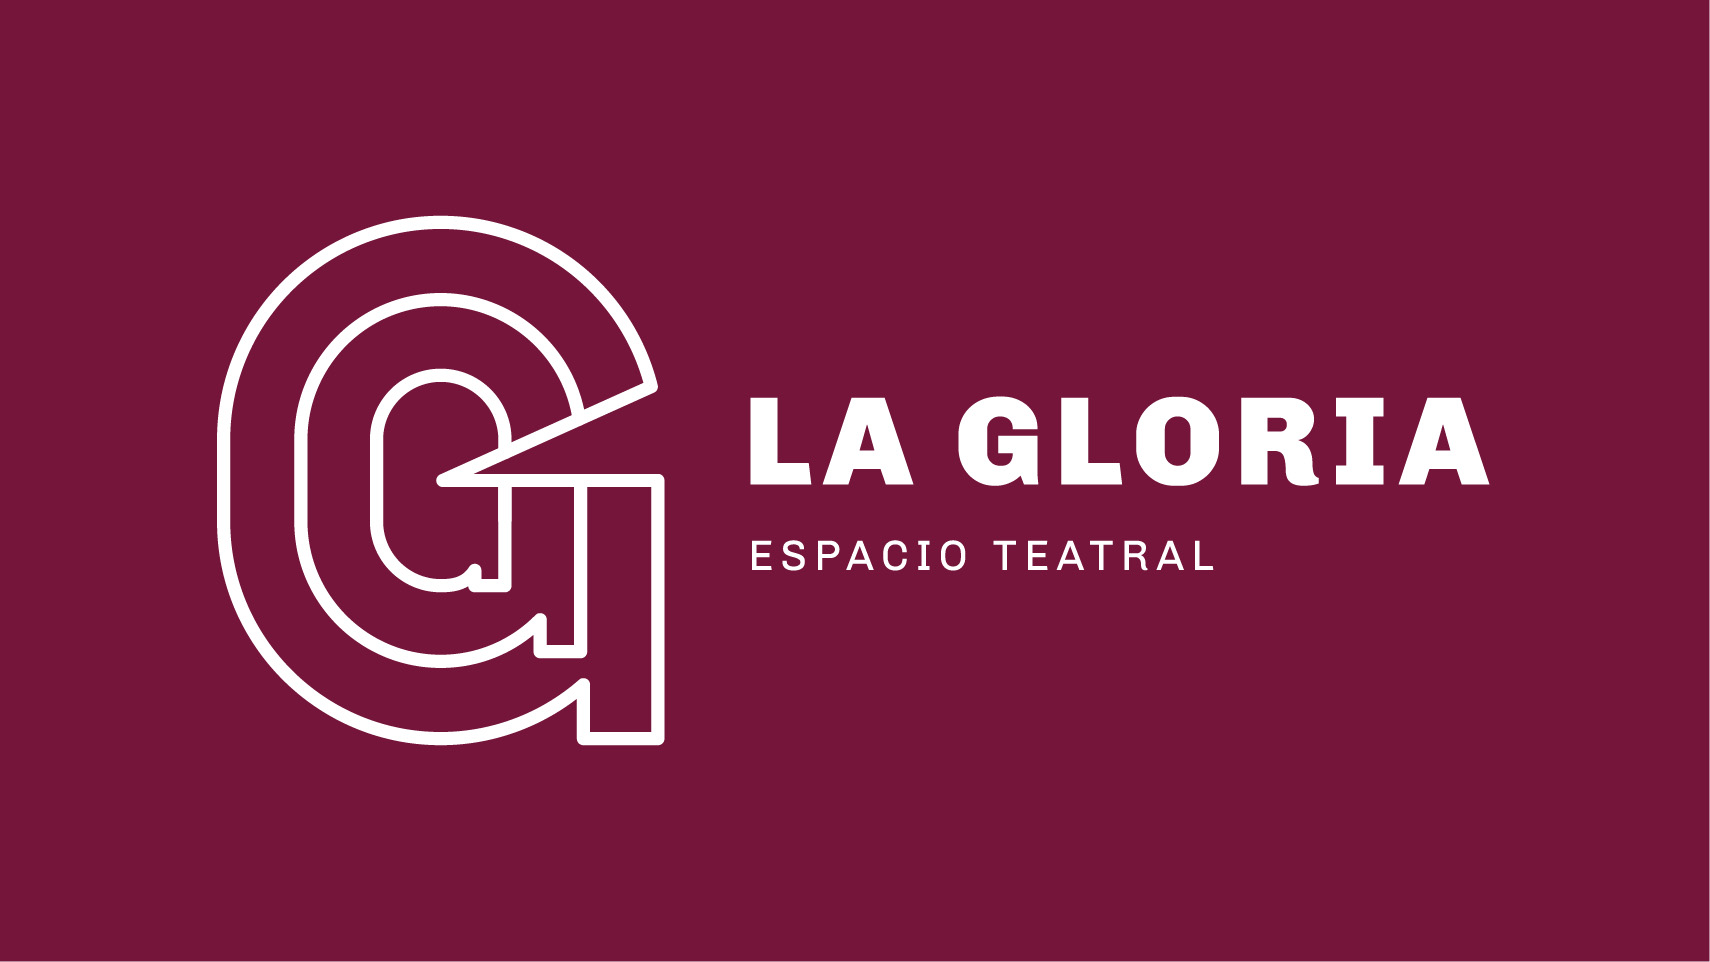 LA GLORIA Espacio Teatral